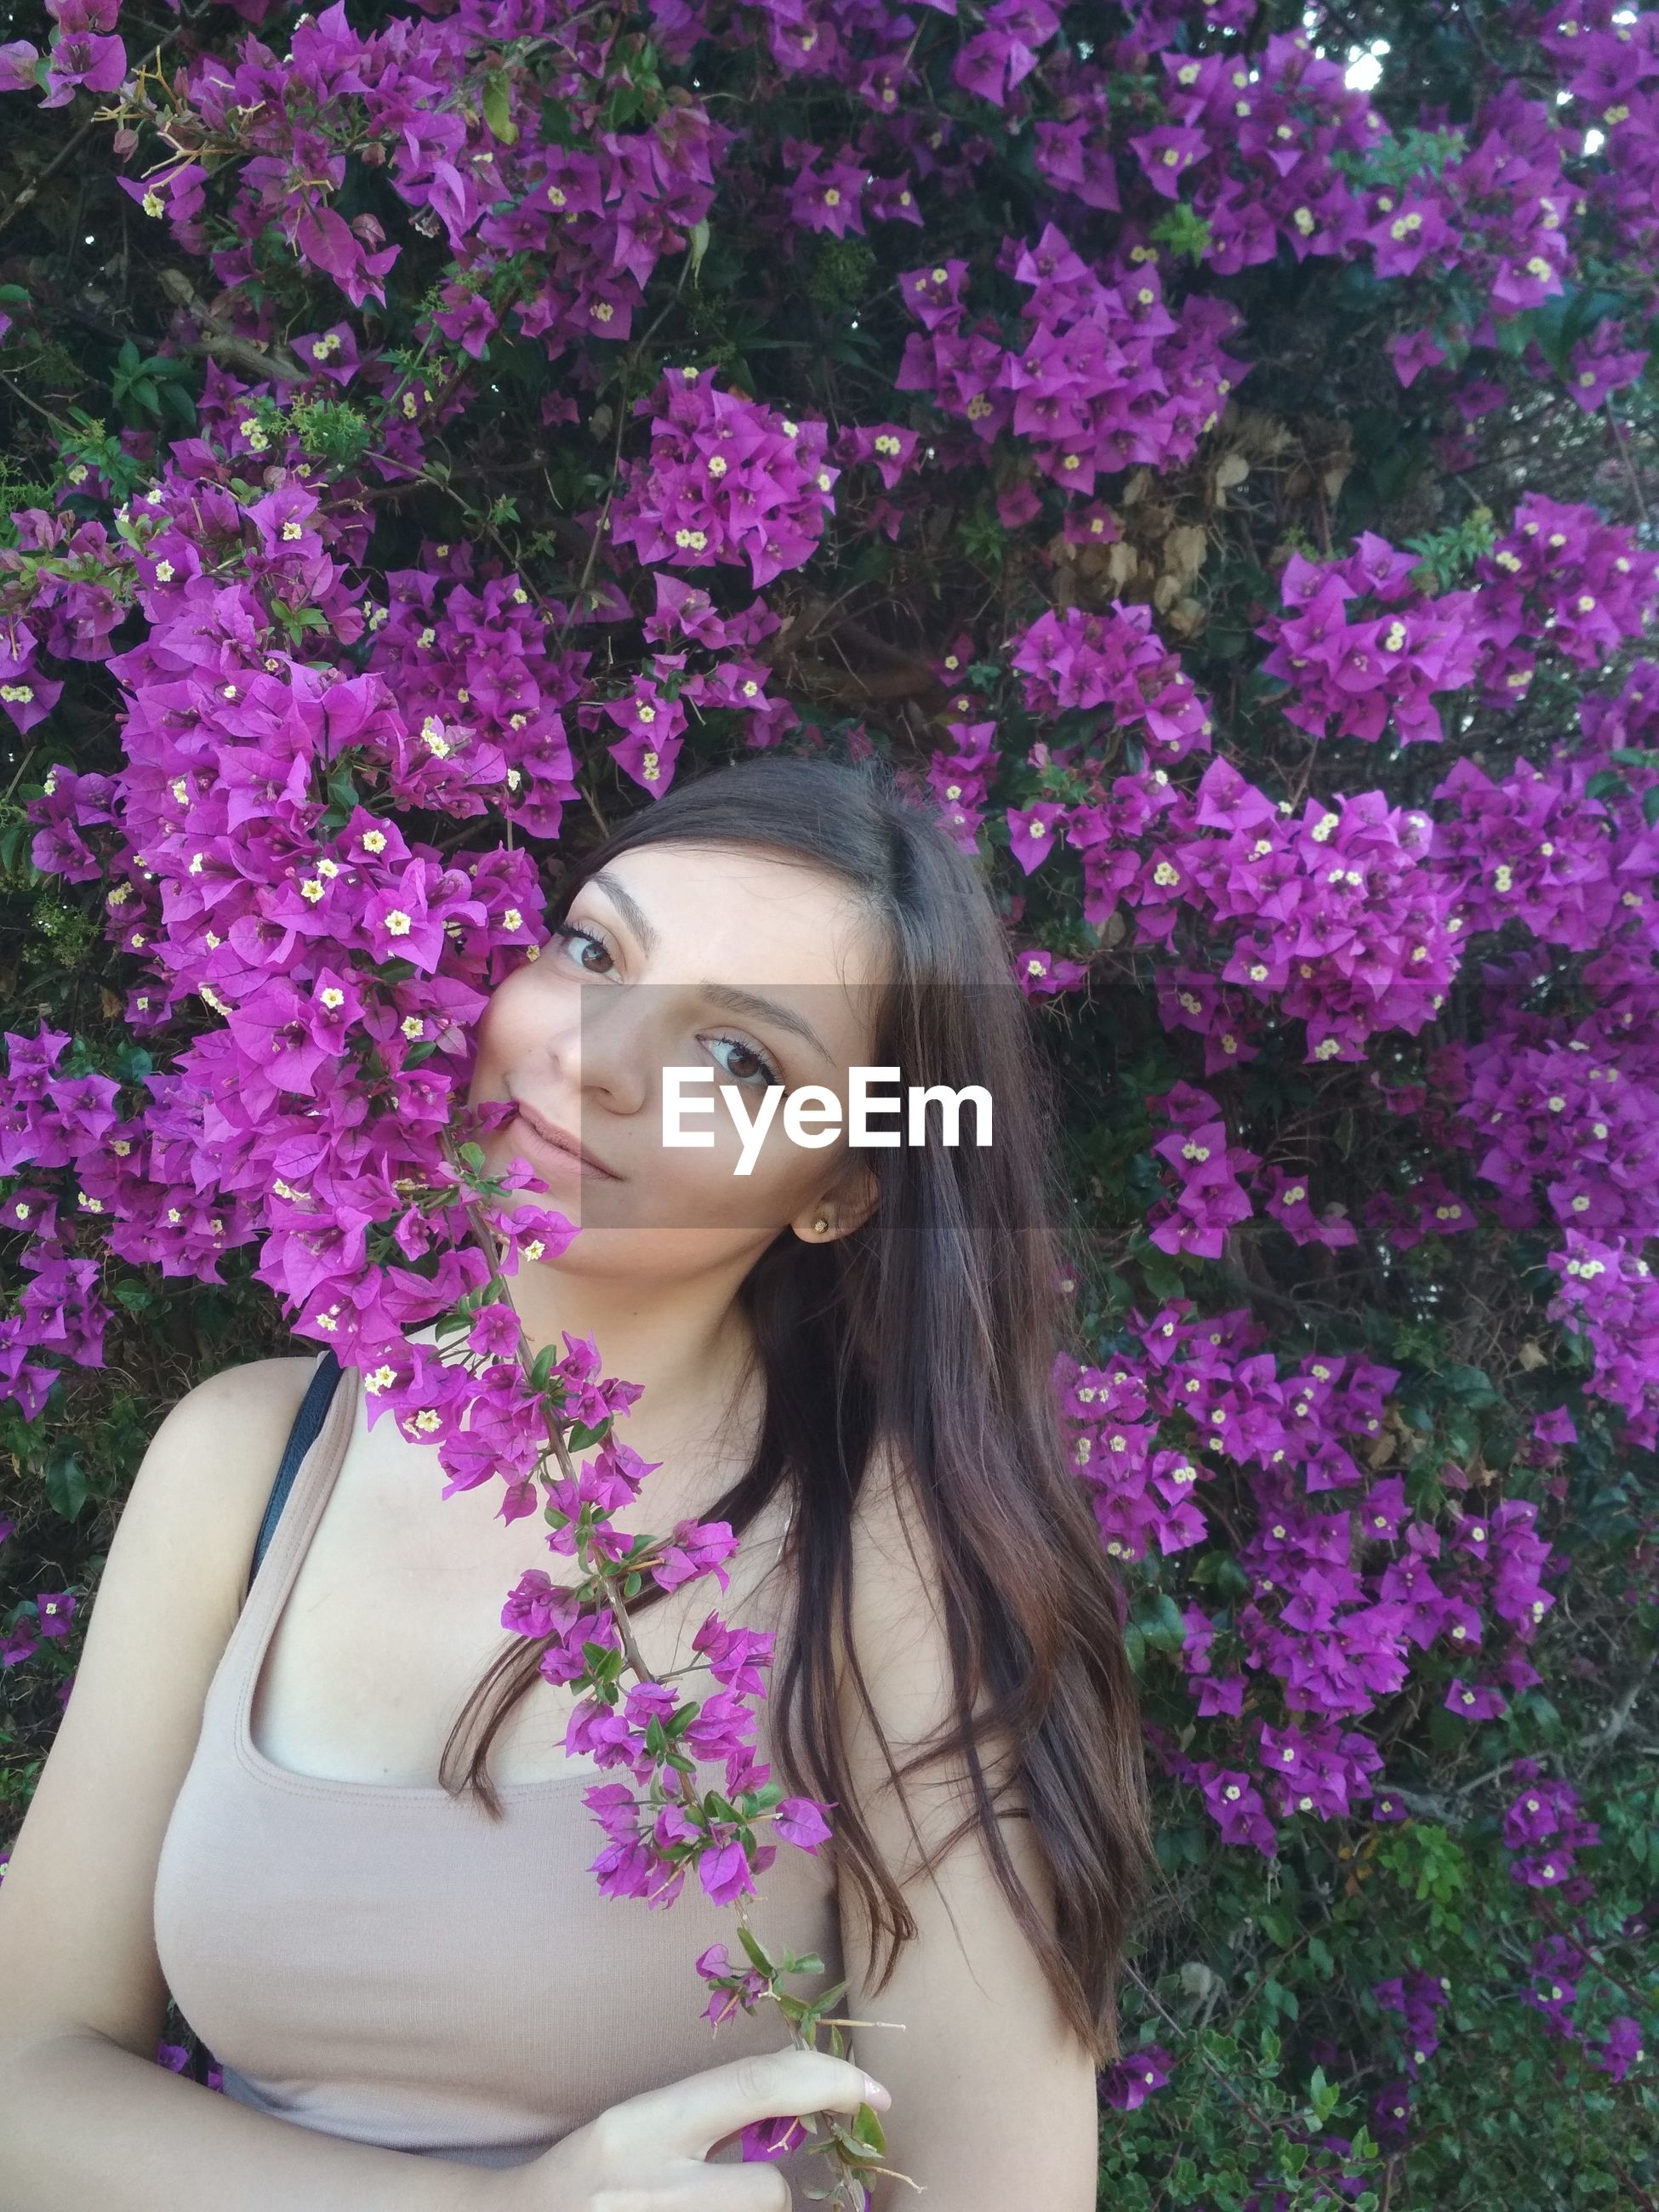 Portrait of young woman against purple flowering plants